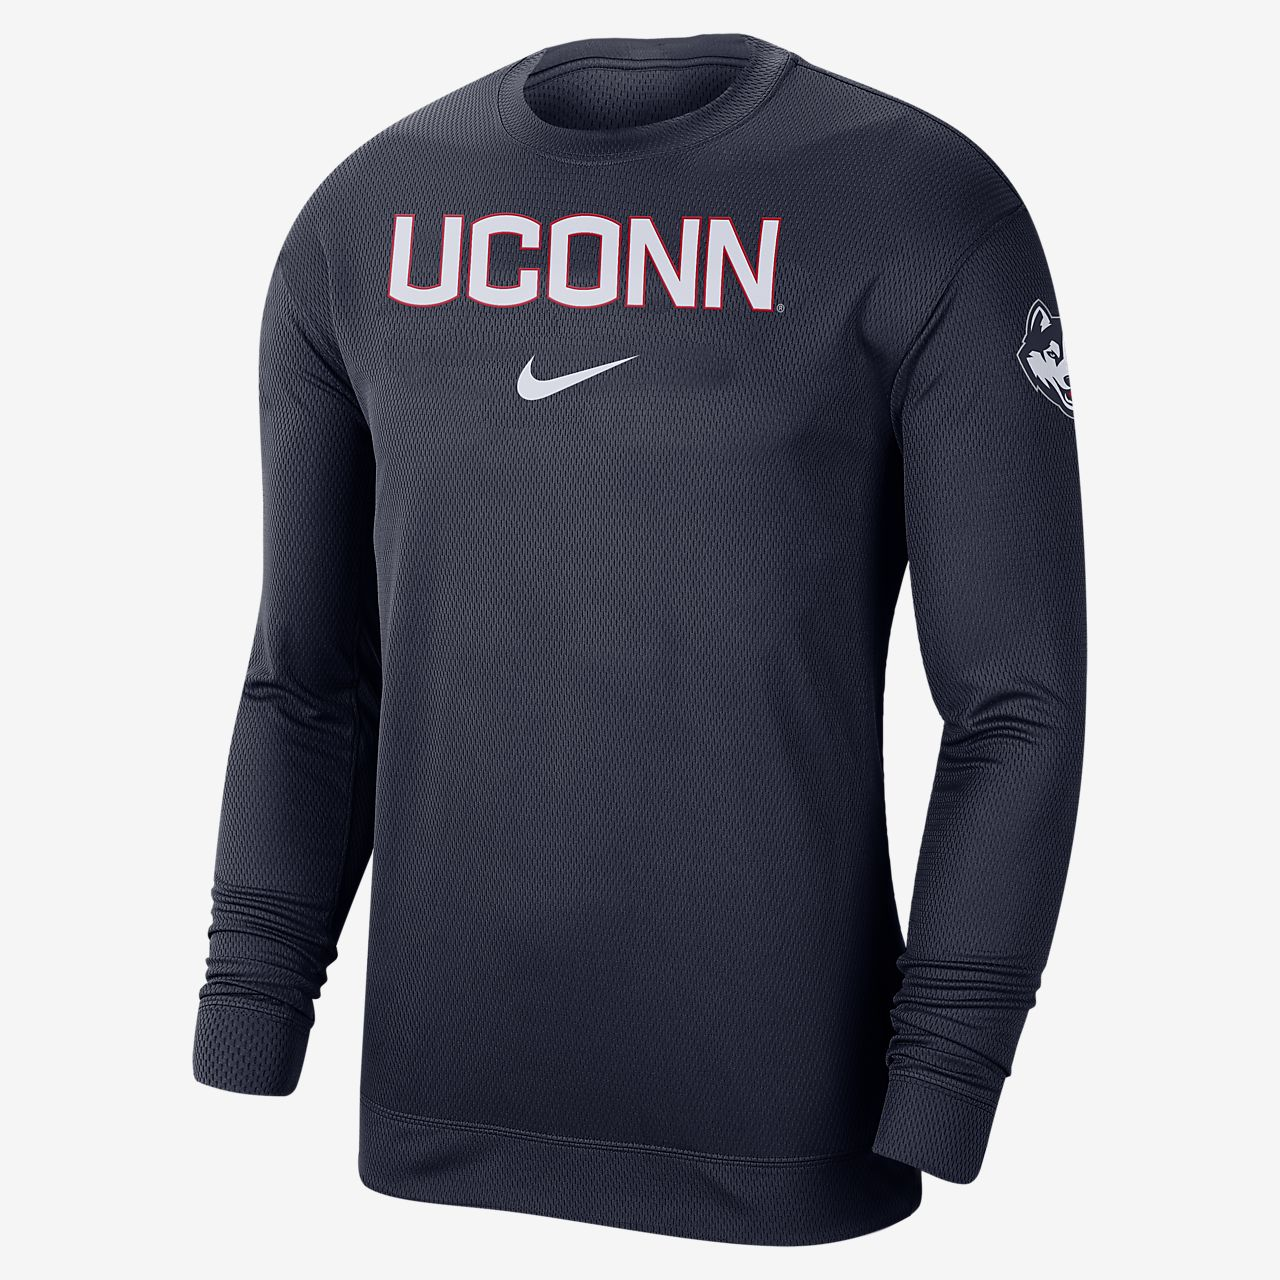 Nike College Dri-FIT Spotlight (UConn) Men's Long-Sleeve Top